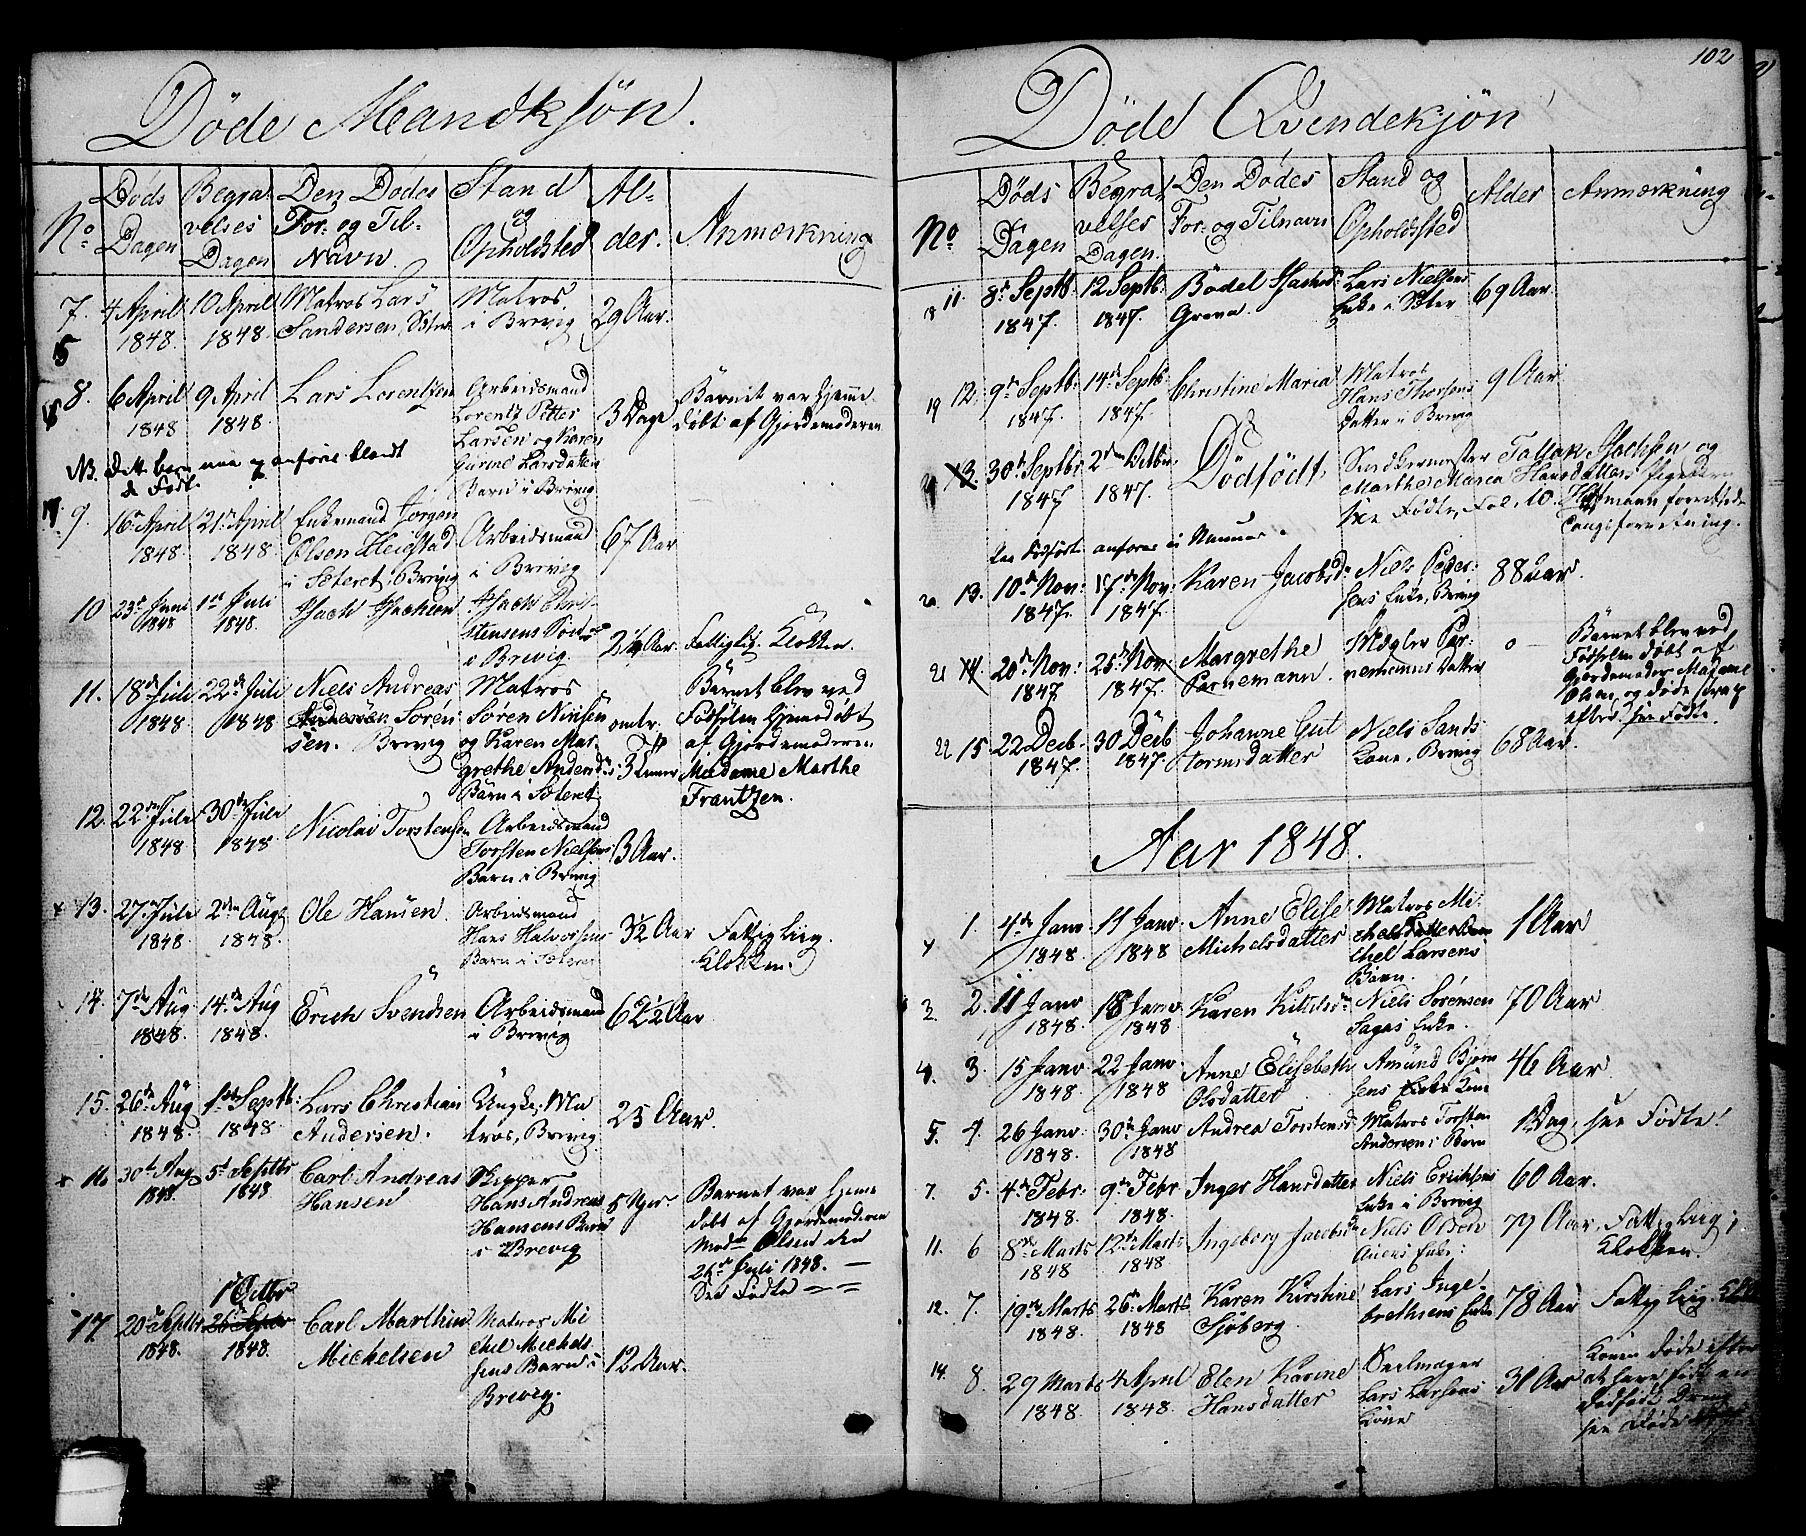 SAKO, Brevik kirkebøker, G/Ga/L0002: Klokkerbok nr. 2, 1846-1865, s. 102